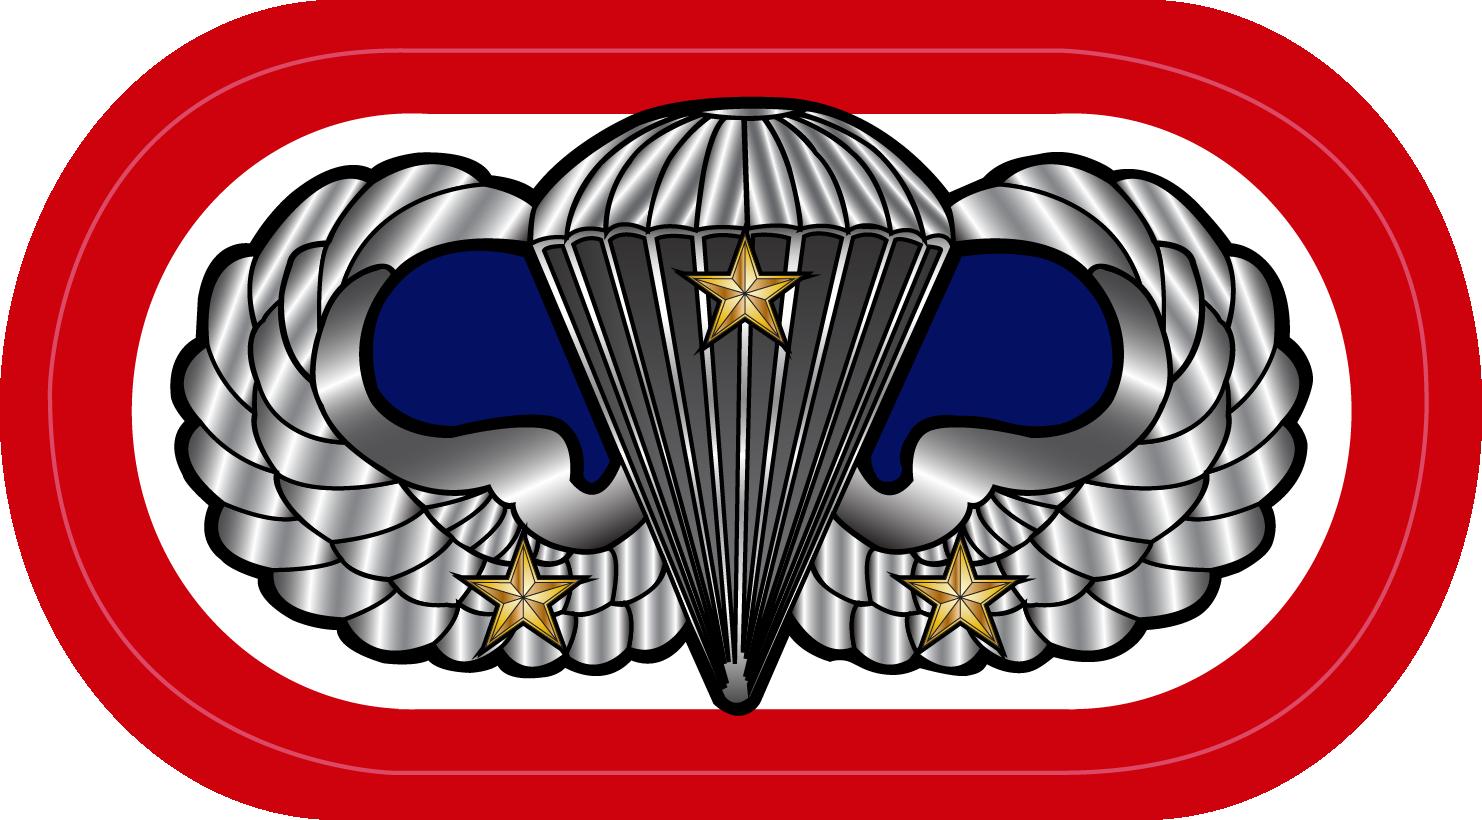 Cornol clipart airborne Clipart  Collection Airborne clipart